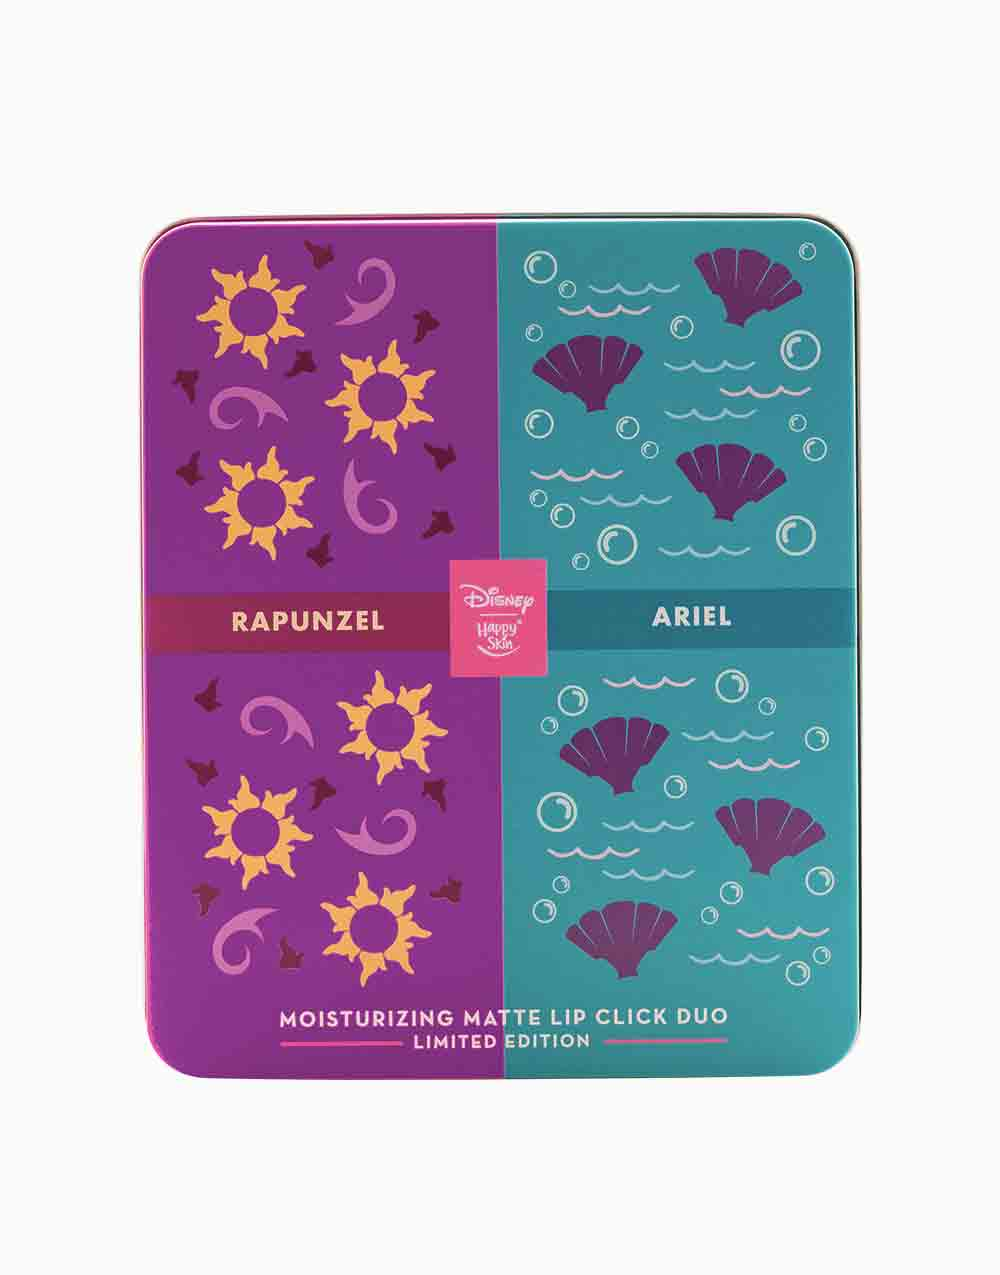 Happy Skin x Disney Moisturizing Matte Lip Click Duo (Limited Edition) by Happy Skin | Rapunzel & Ariel